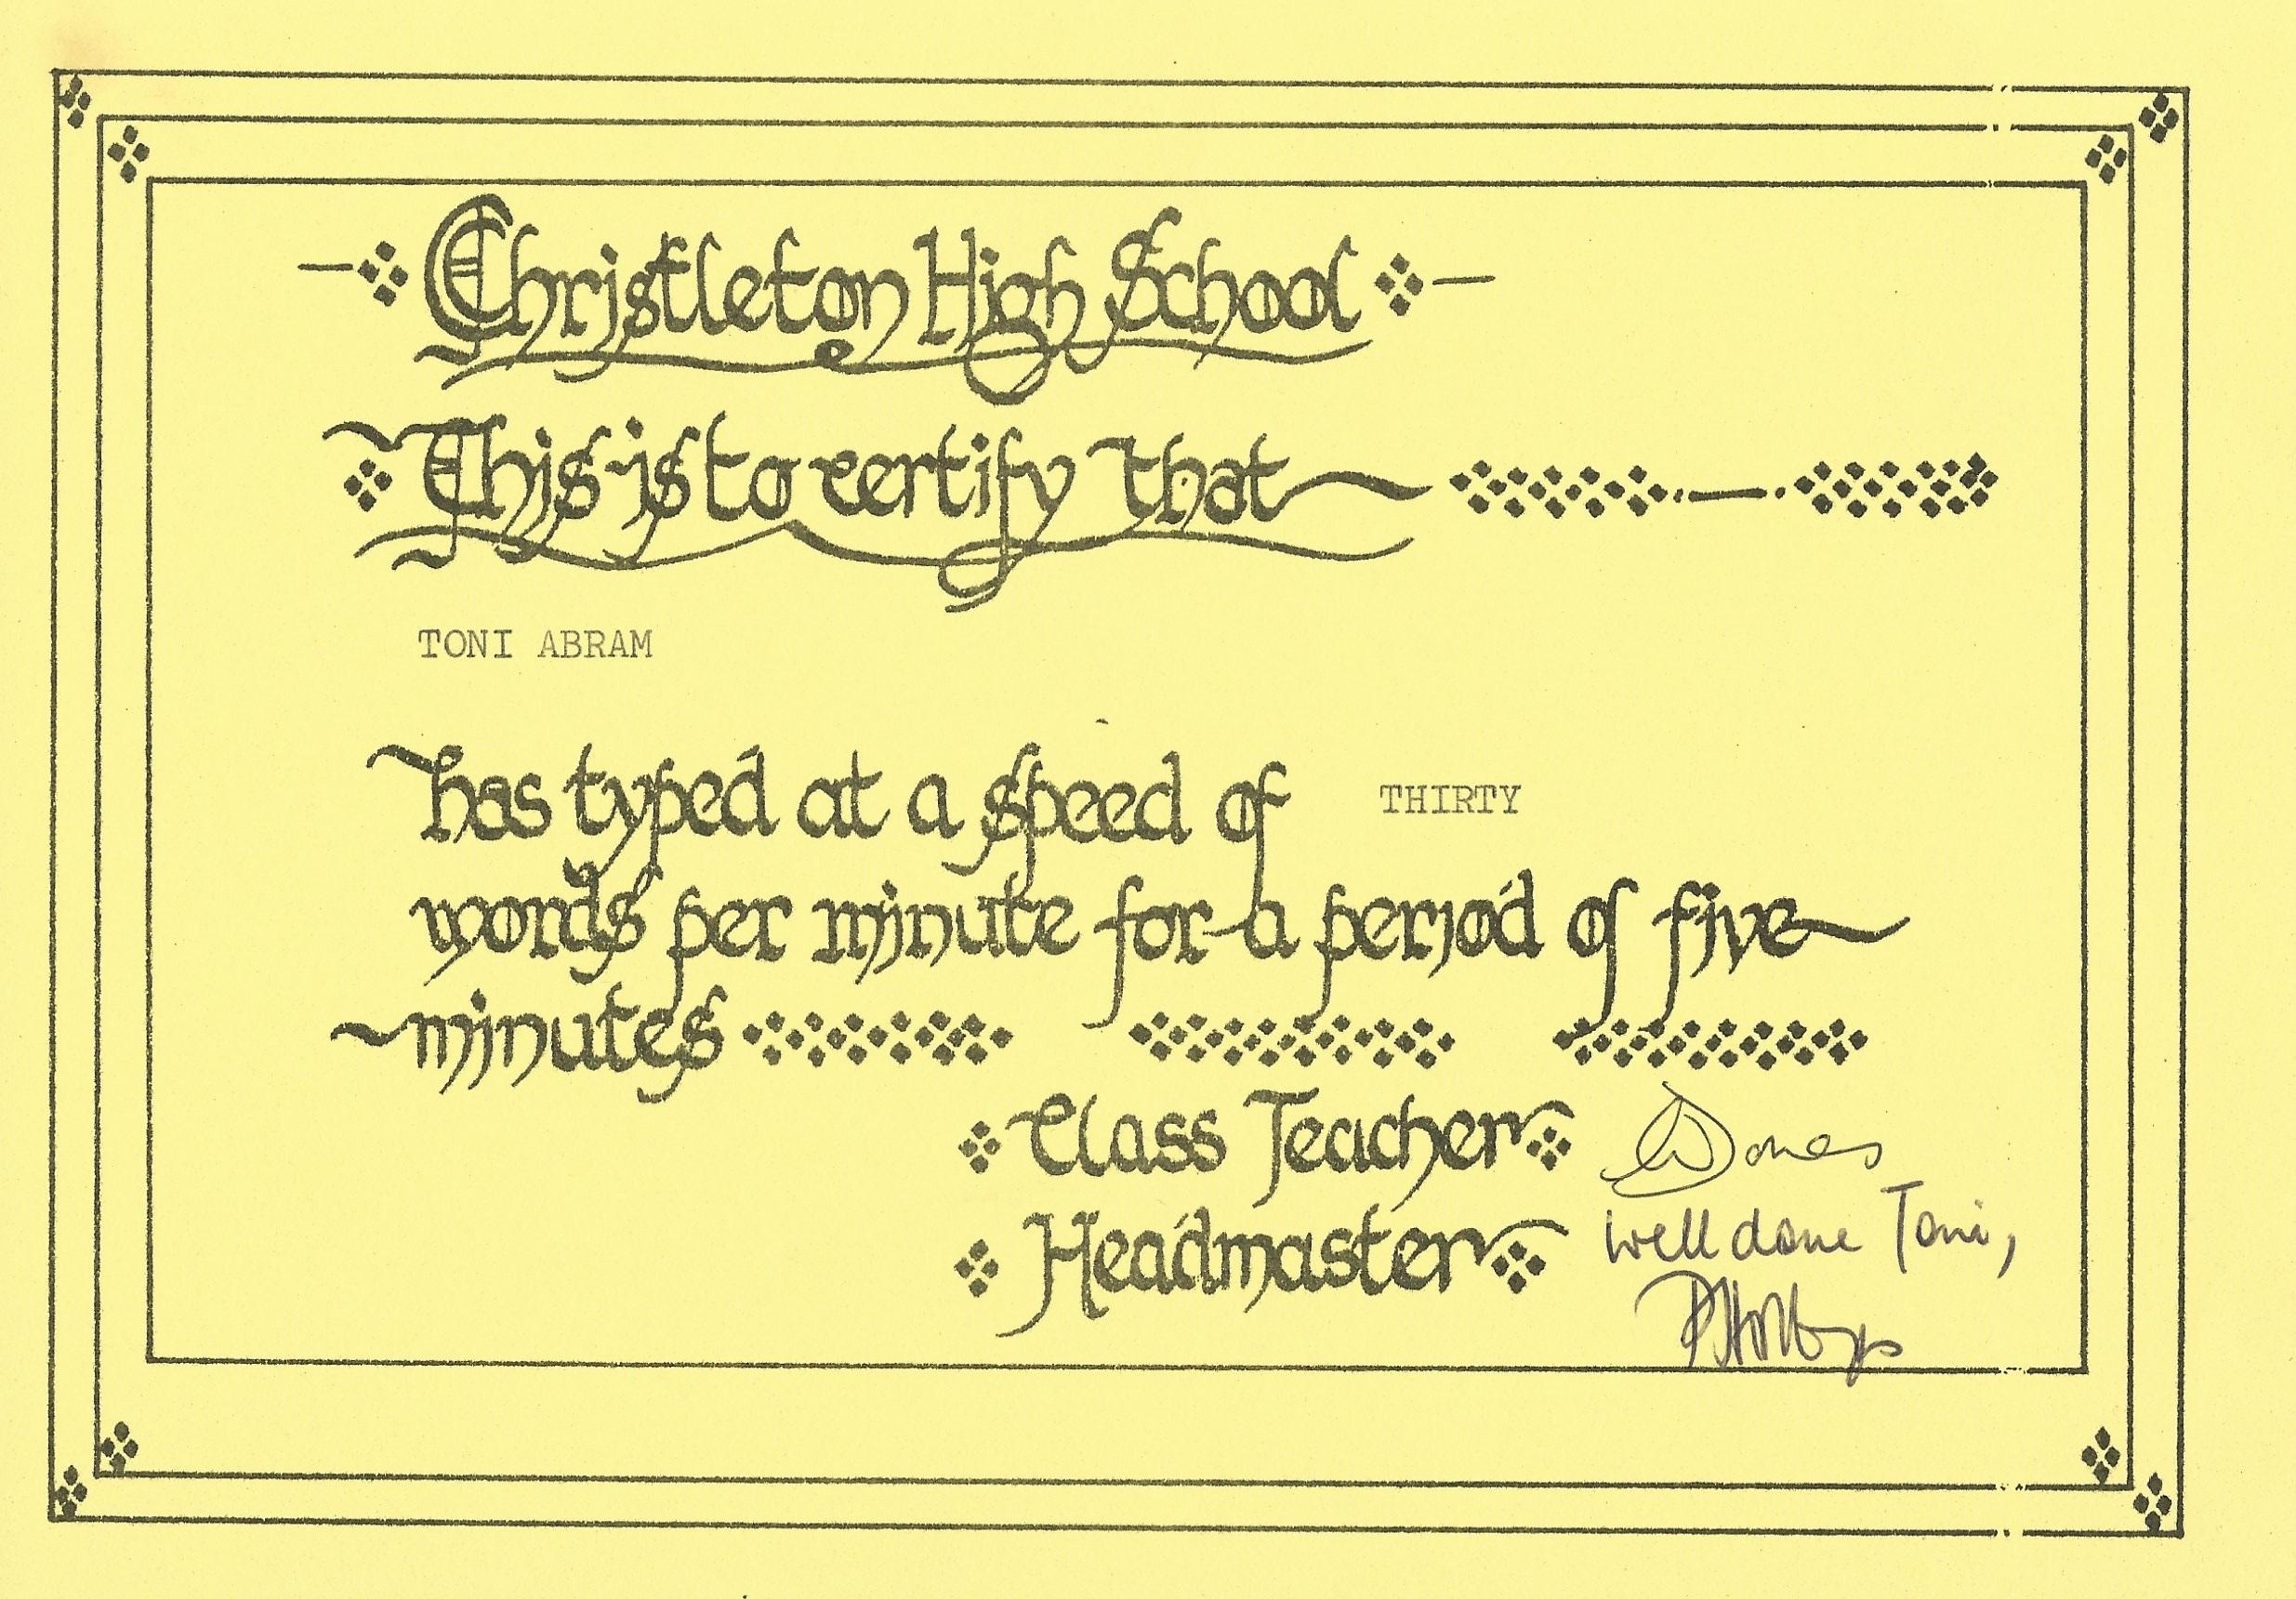 Speed test certificate.